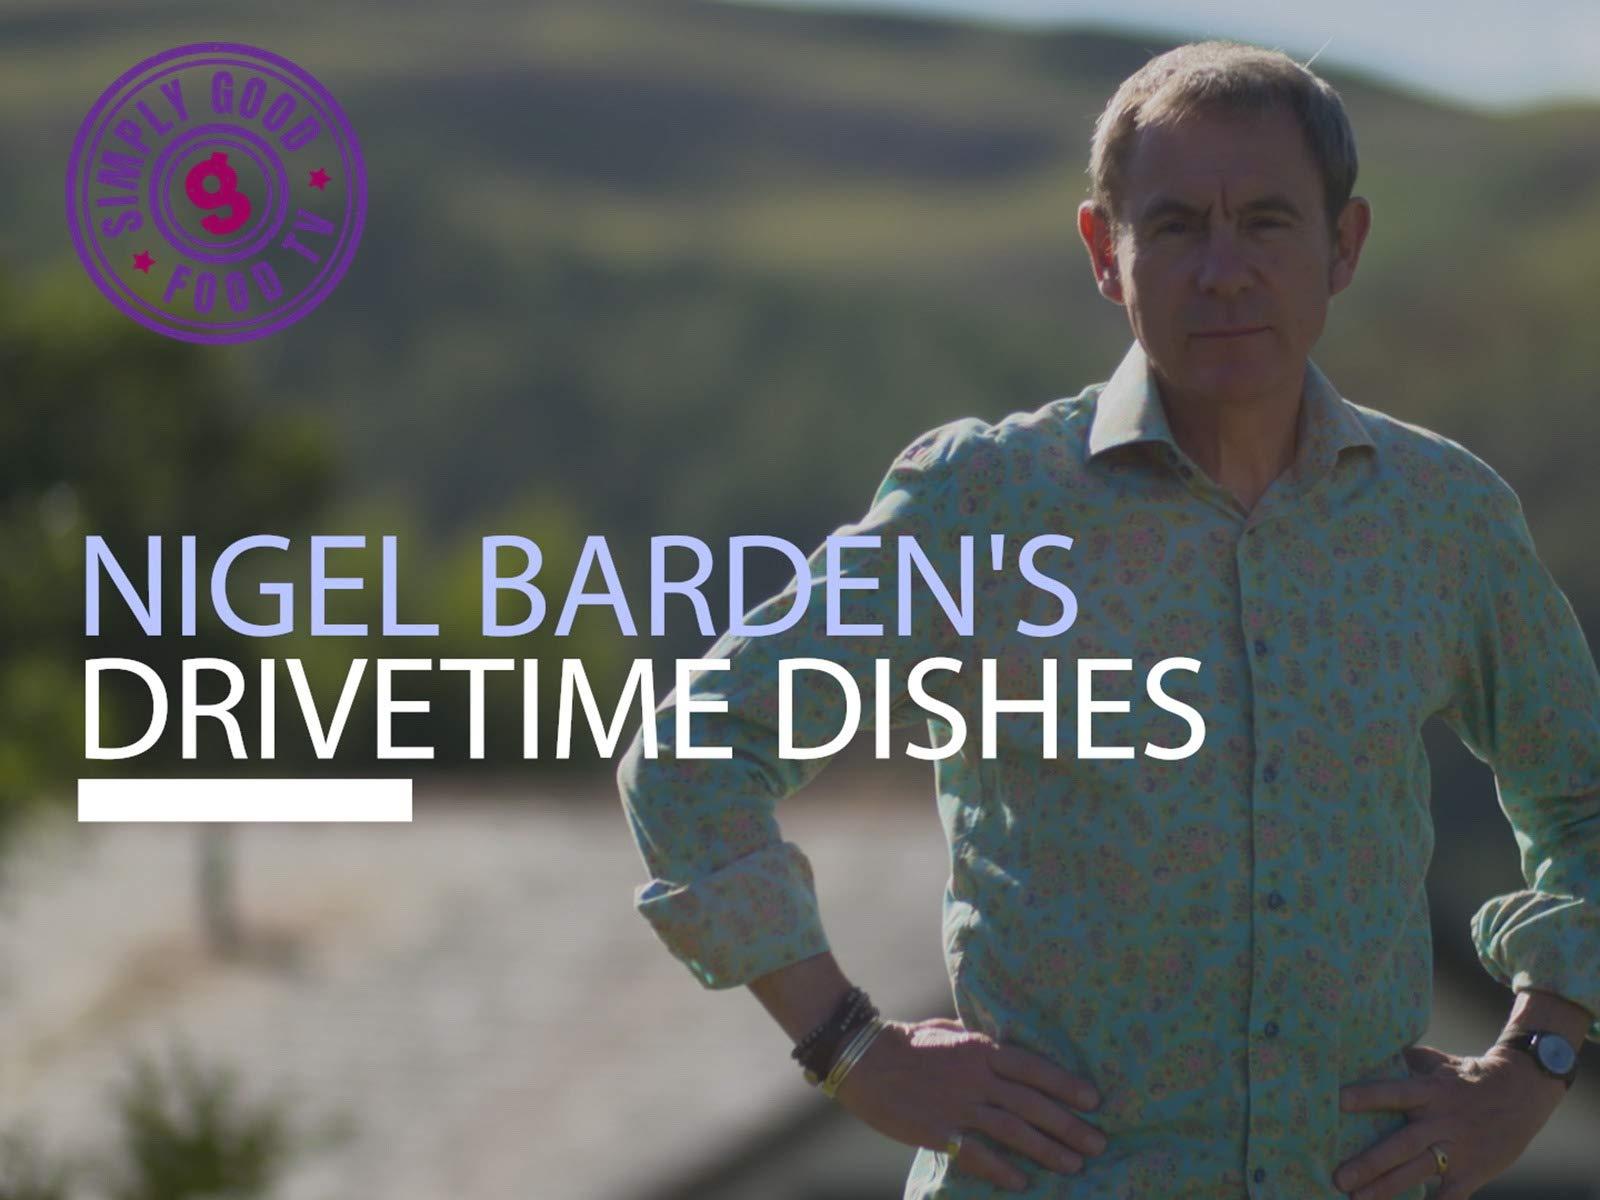 Nigel Barden's Drivetime Dishes - Season 1